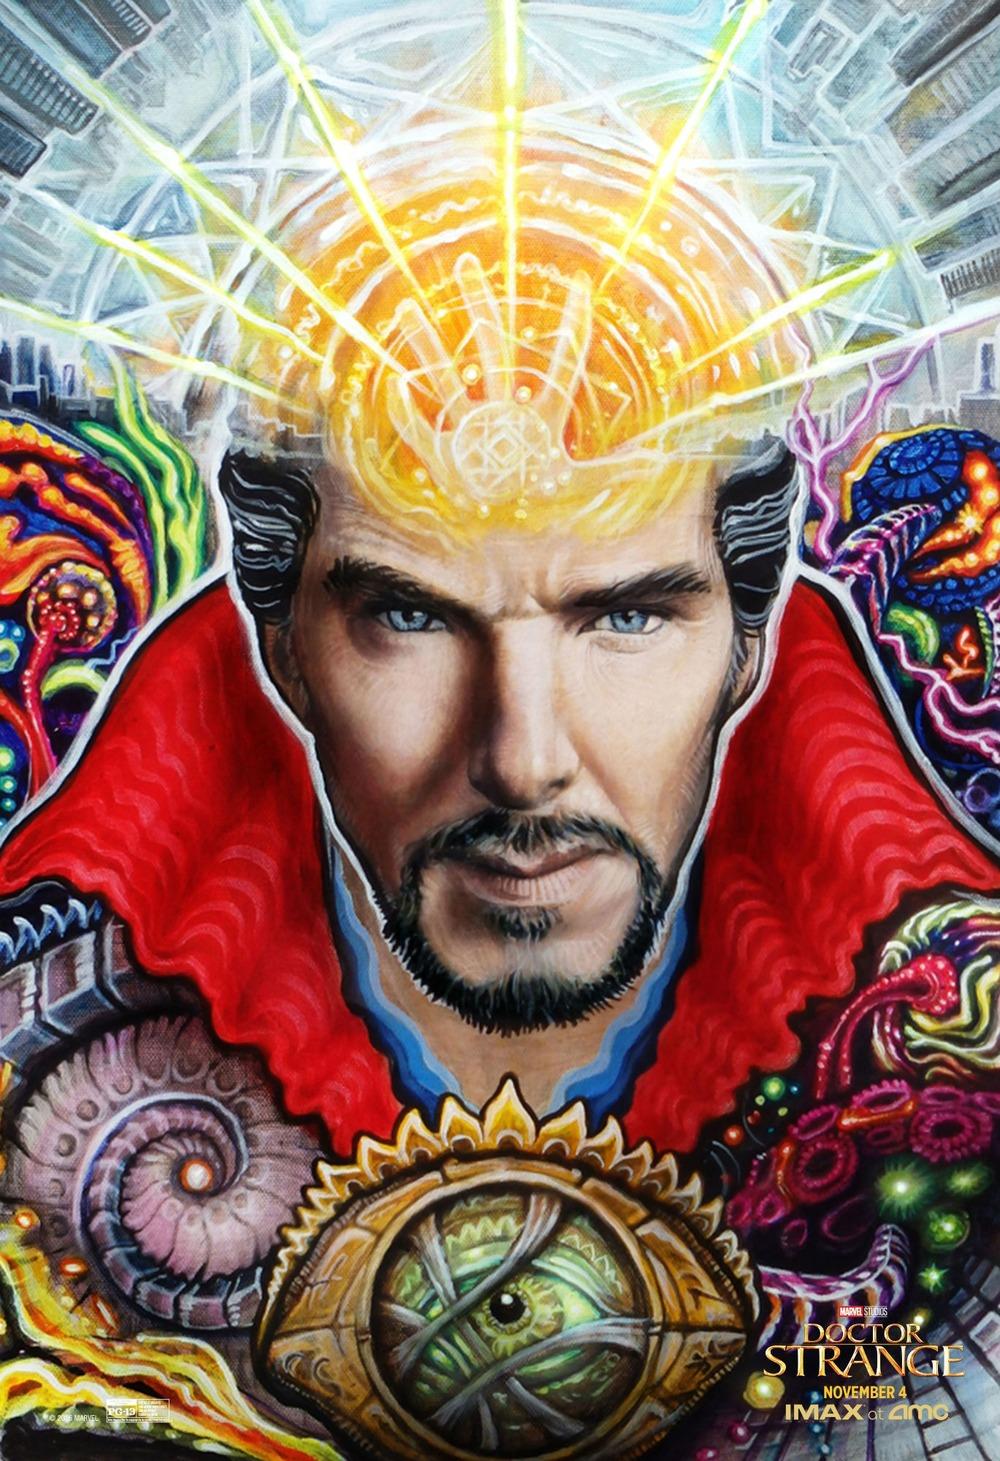 Doctor strange dvd release date redbox netflix itunes - Doctor strange images ...